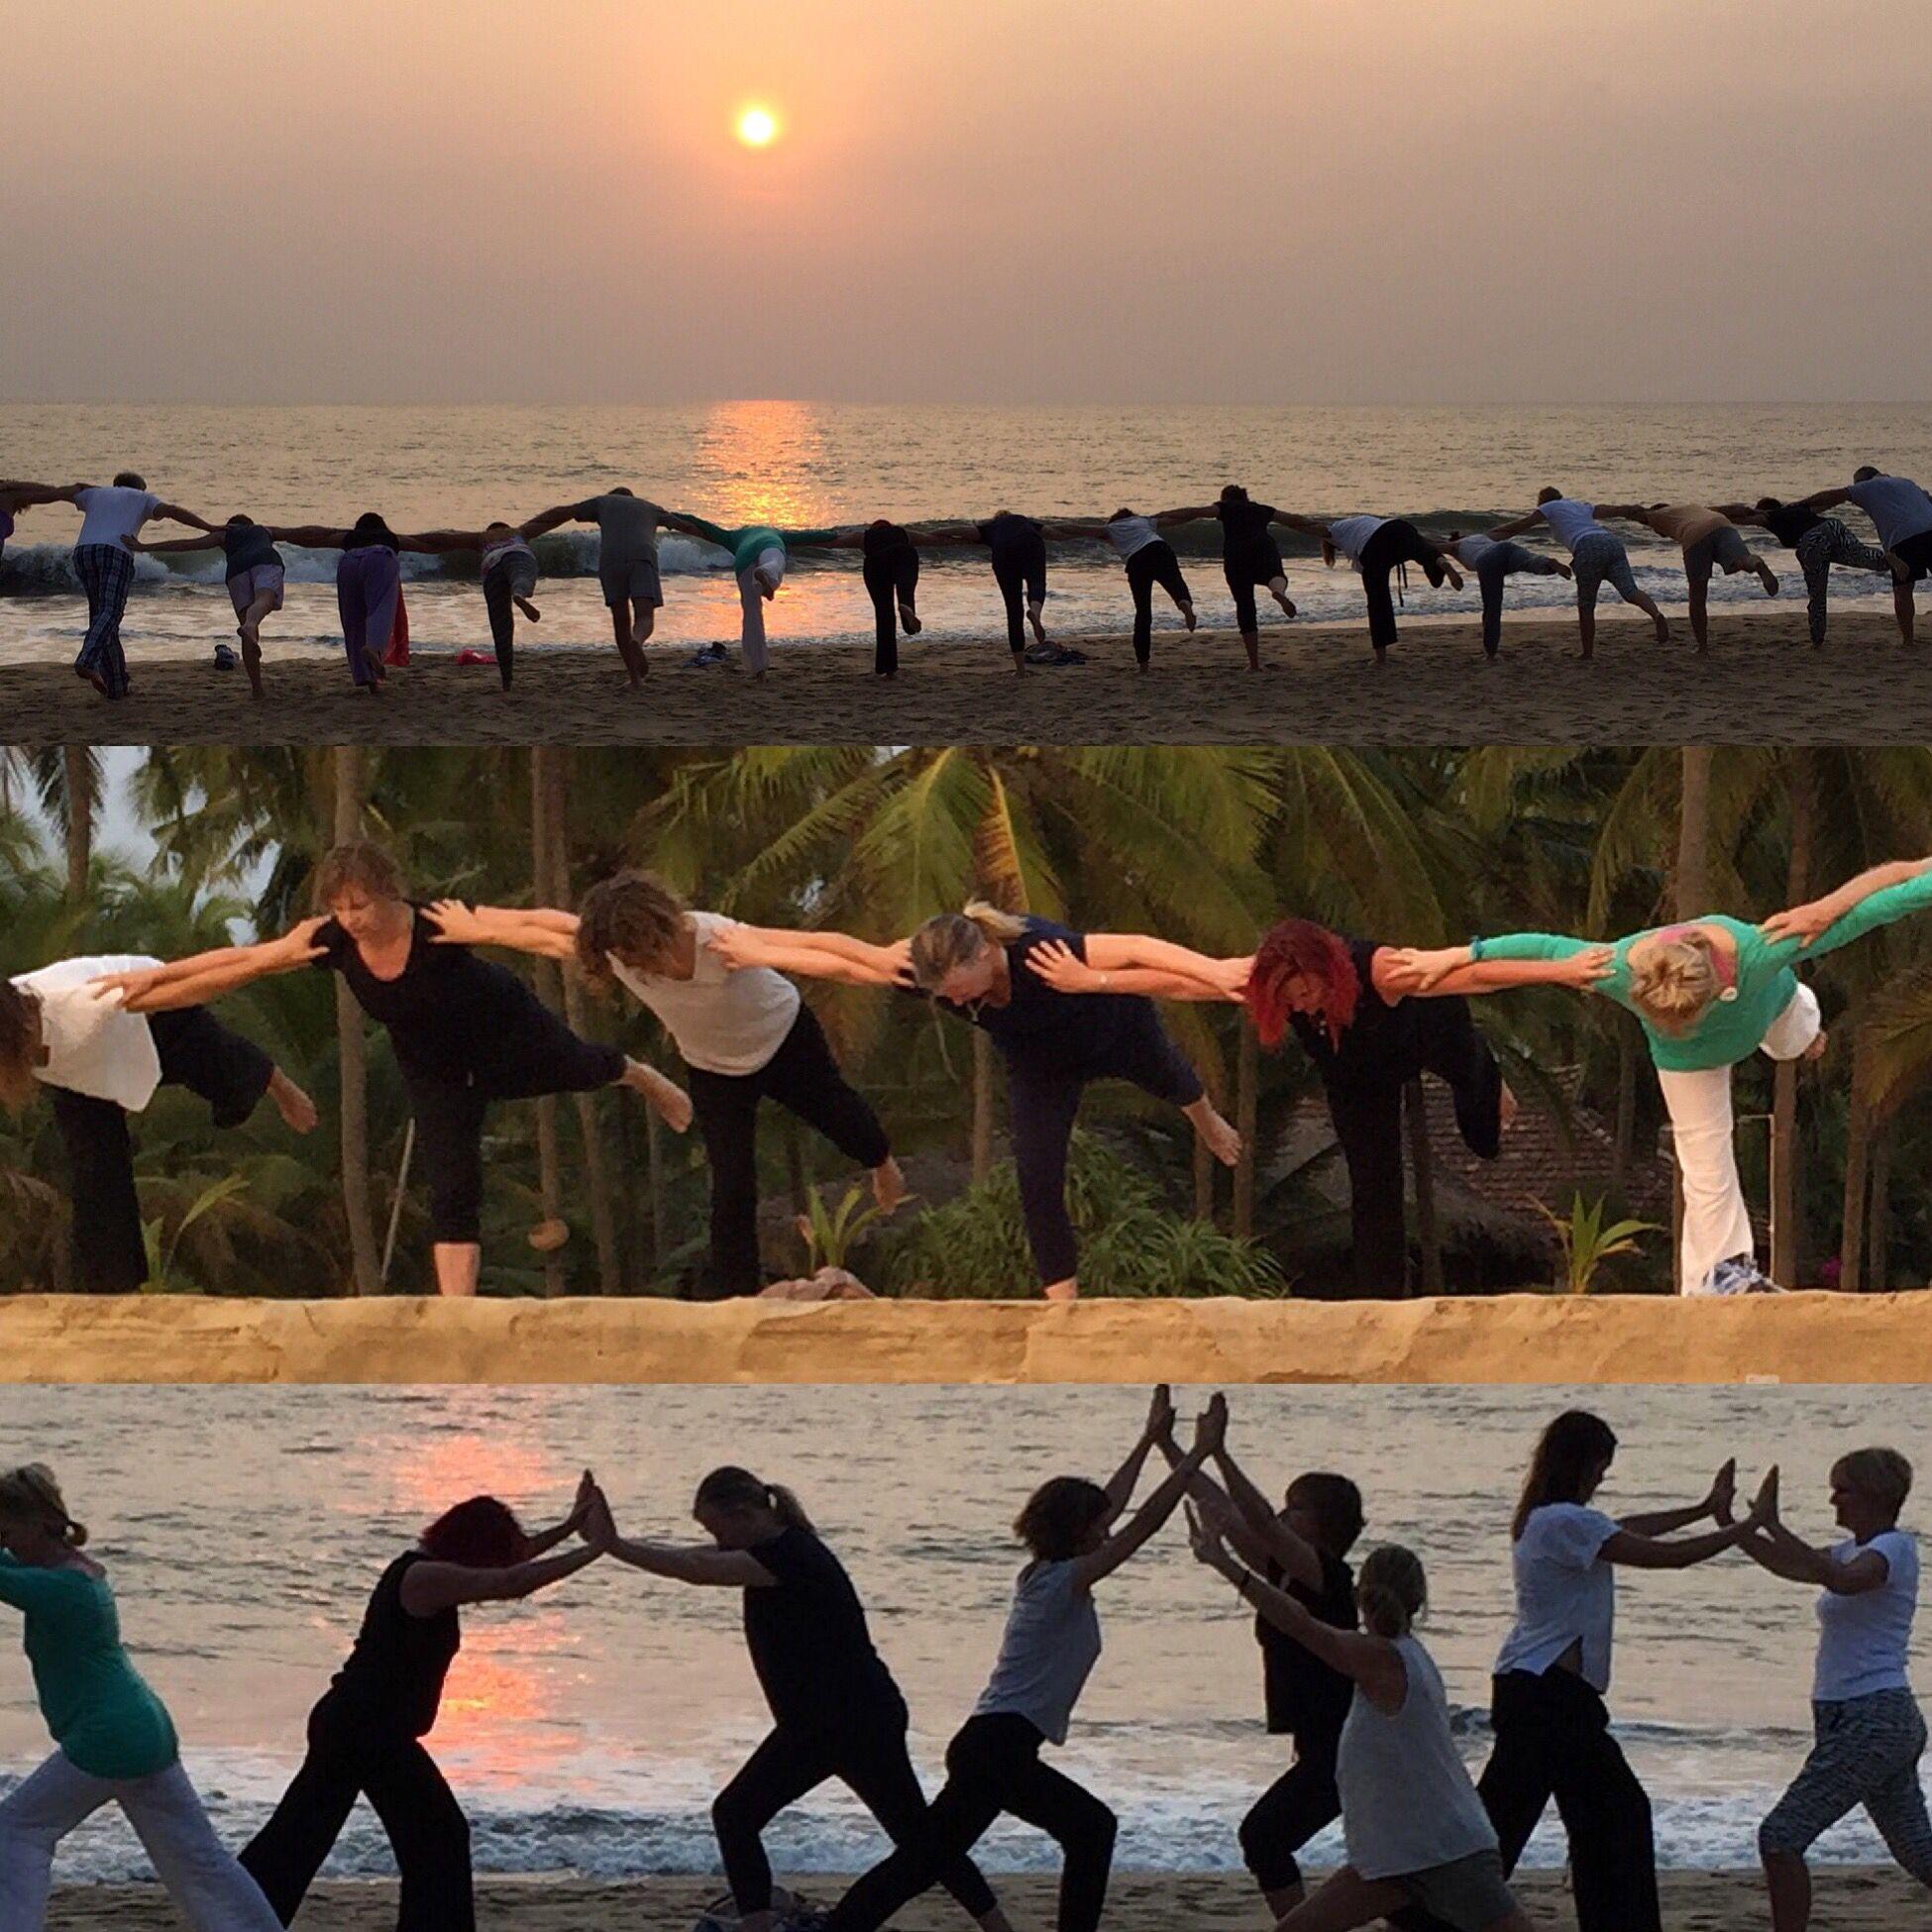 When the voice in your head tells you to travel LISTEN! In 10 years you'll wish you had! www.elisawilliamsyoga.com/yoga-in-kerala #yoga  #healthyholidays #retreats #vacation #yogatravel #yogaforeveryone #yogaforlife #kerala #india